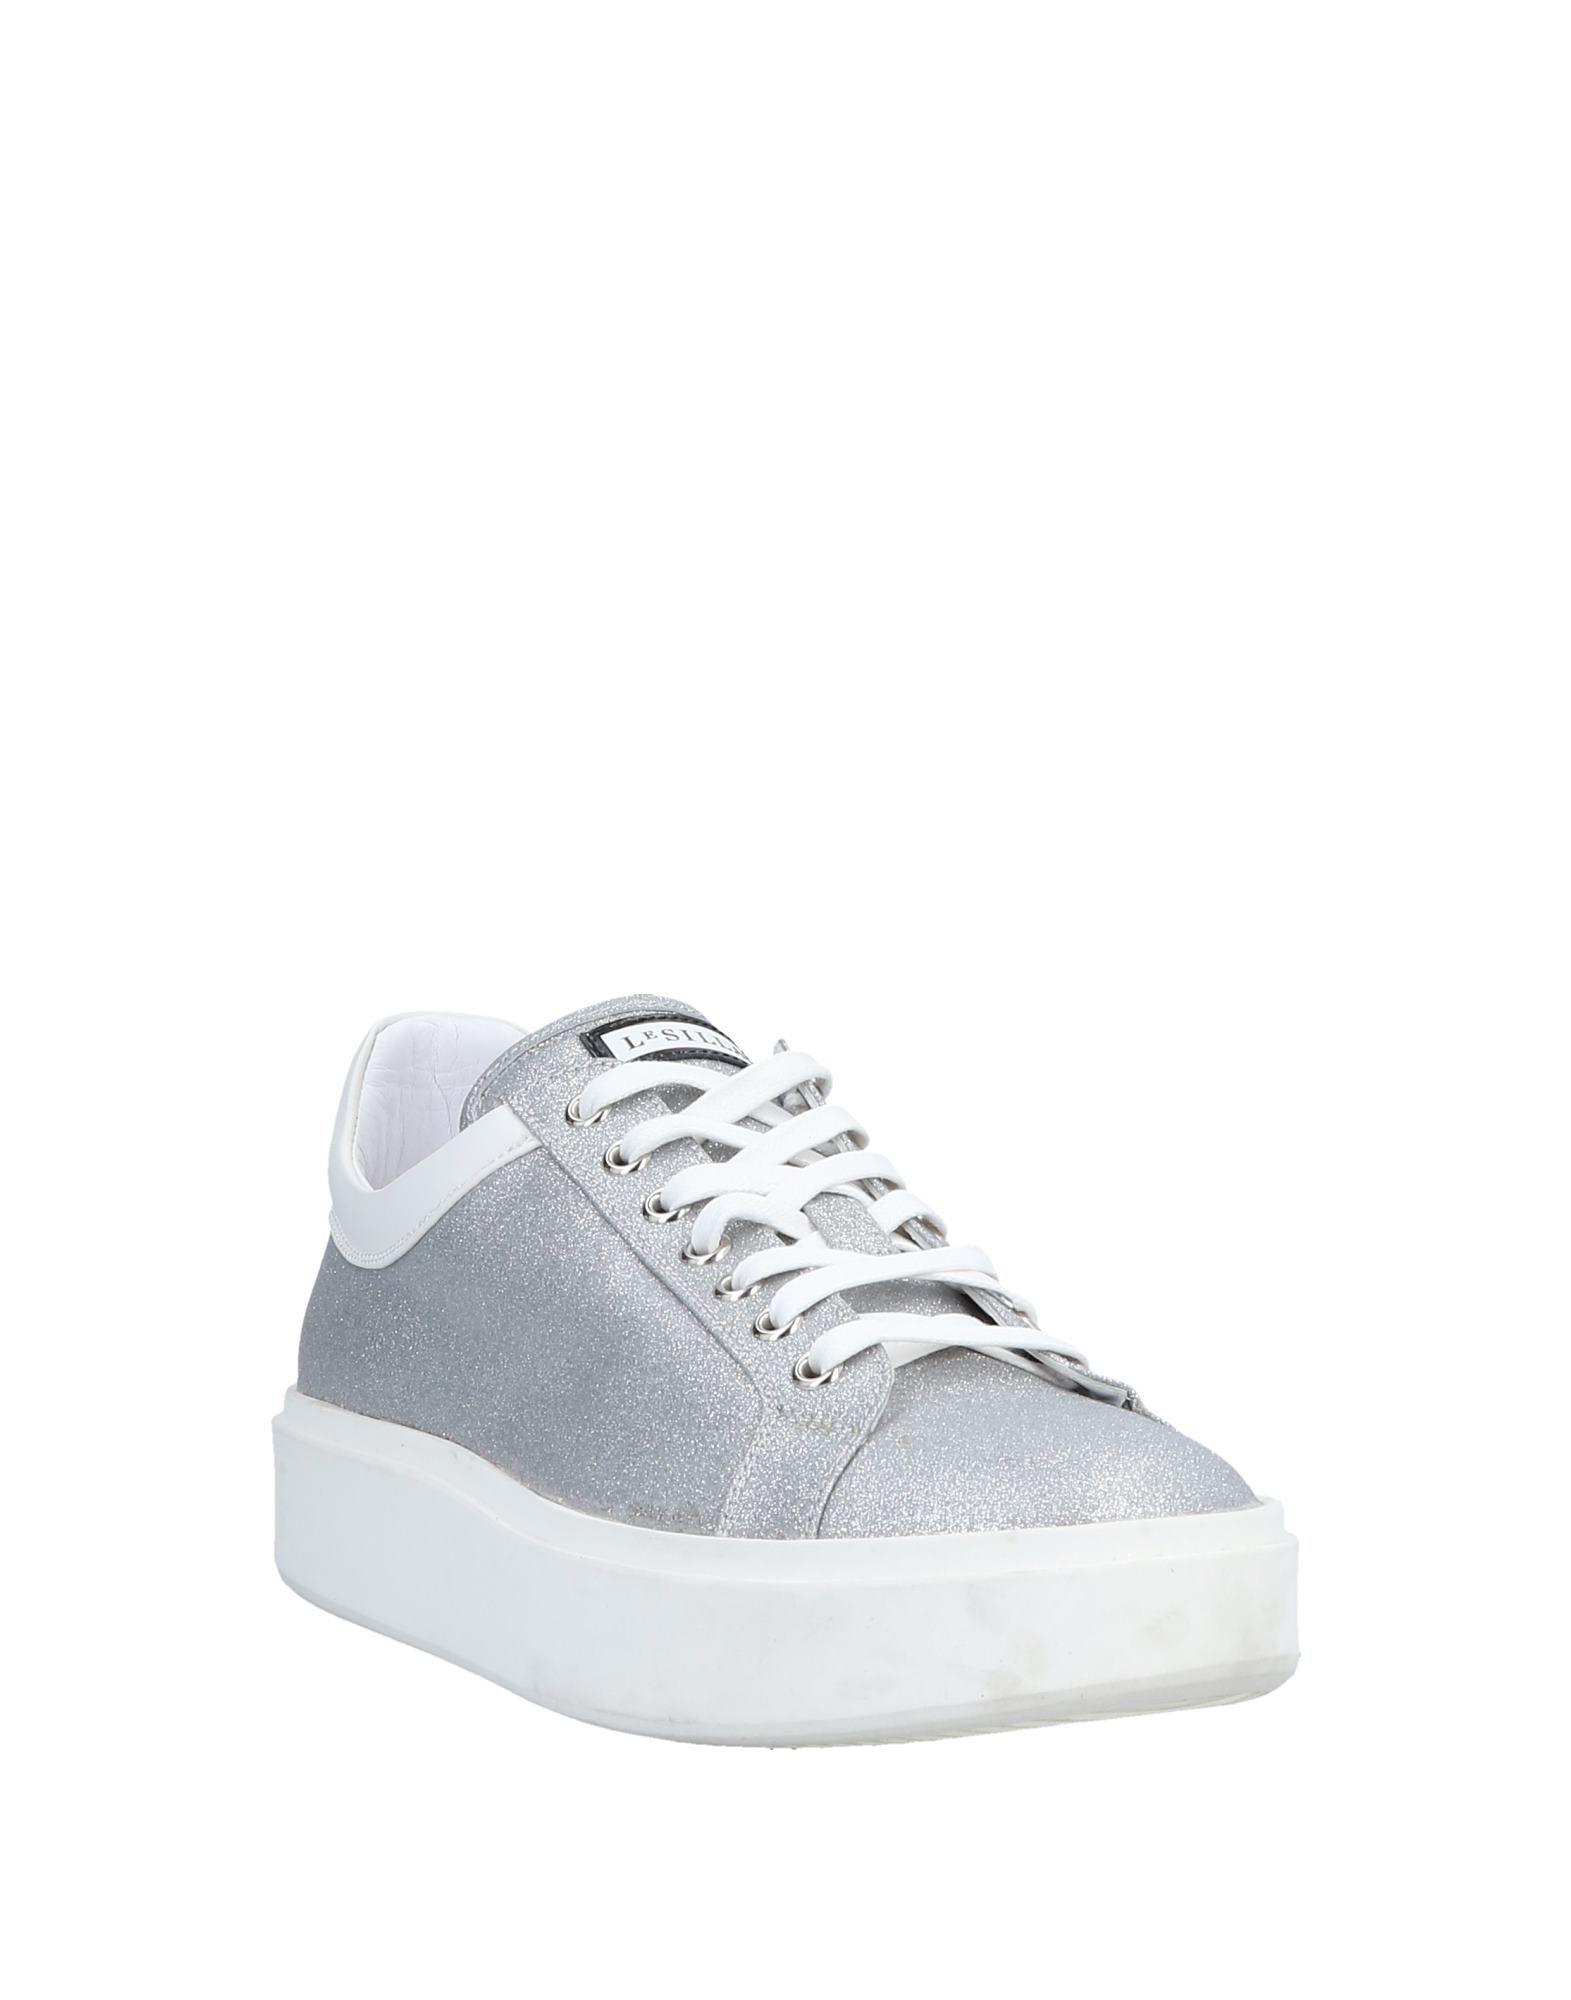 Le Silla Silver Leather Sneakers